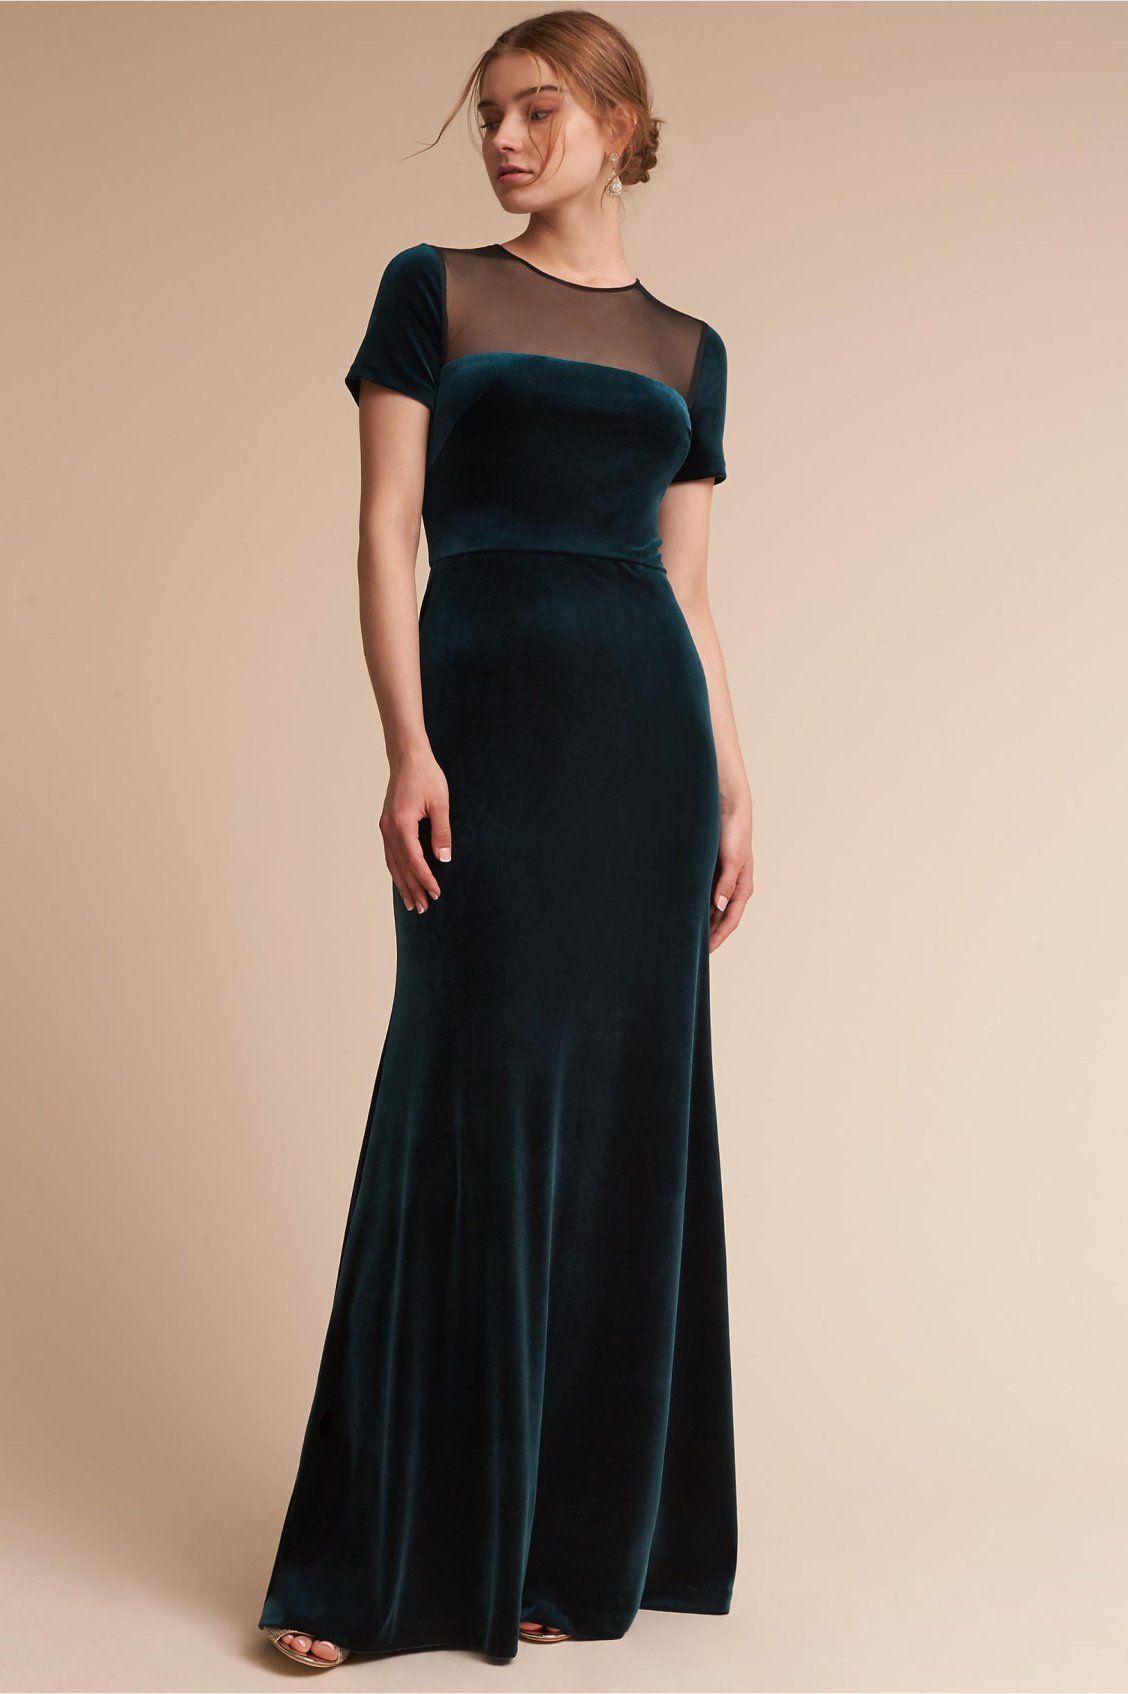 Velvet Pine Green Iryna Dress From Bhldn Mother Of The Bride Dresses Long Ball Dresses Ball Gown Wedding Dress [ 1694 x 1128 Pixel ]